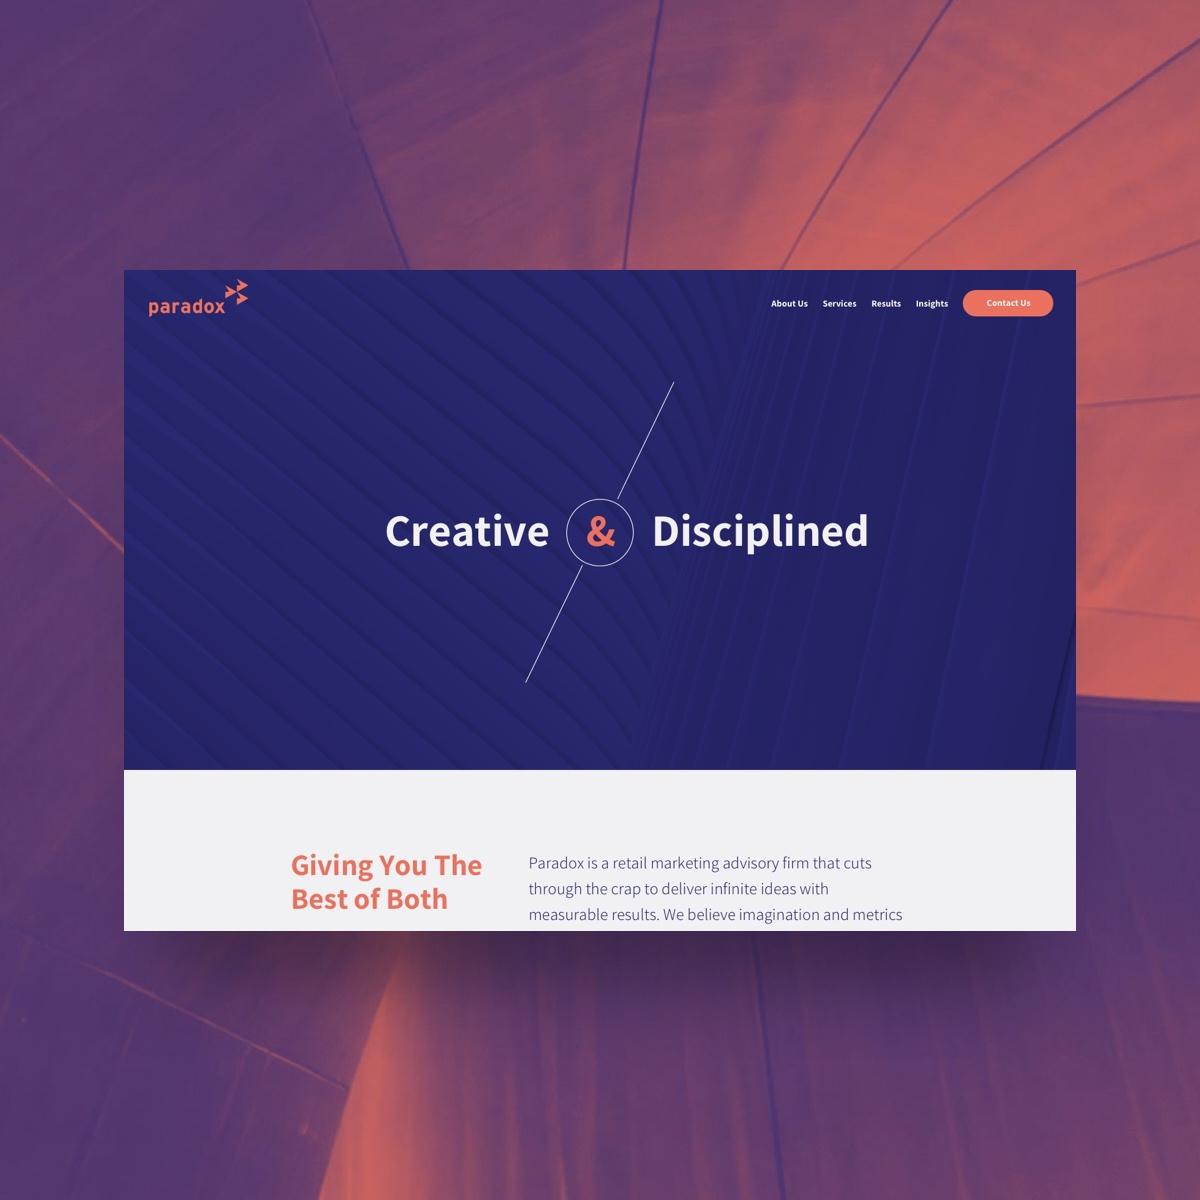 paradox desktop website screenshot